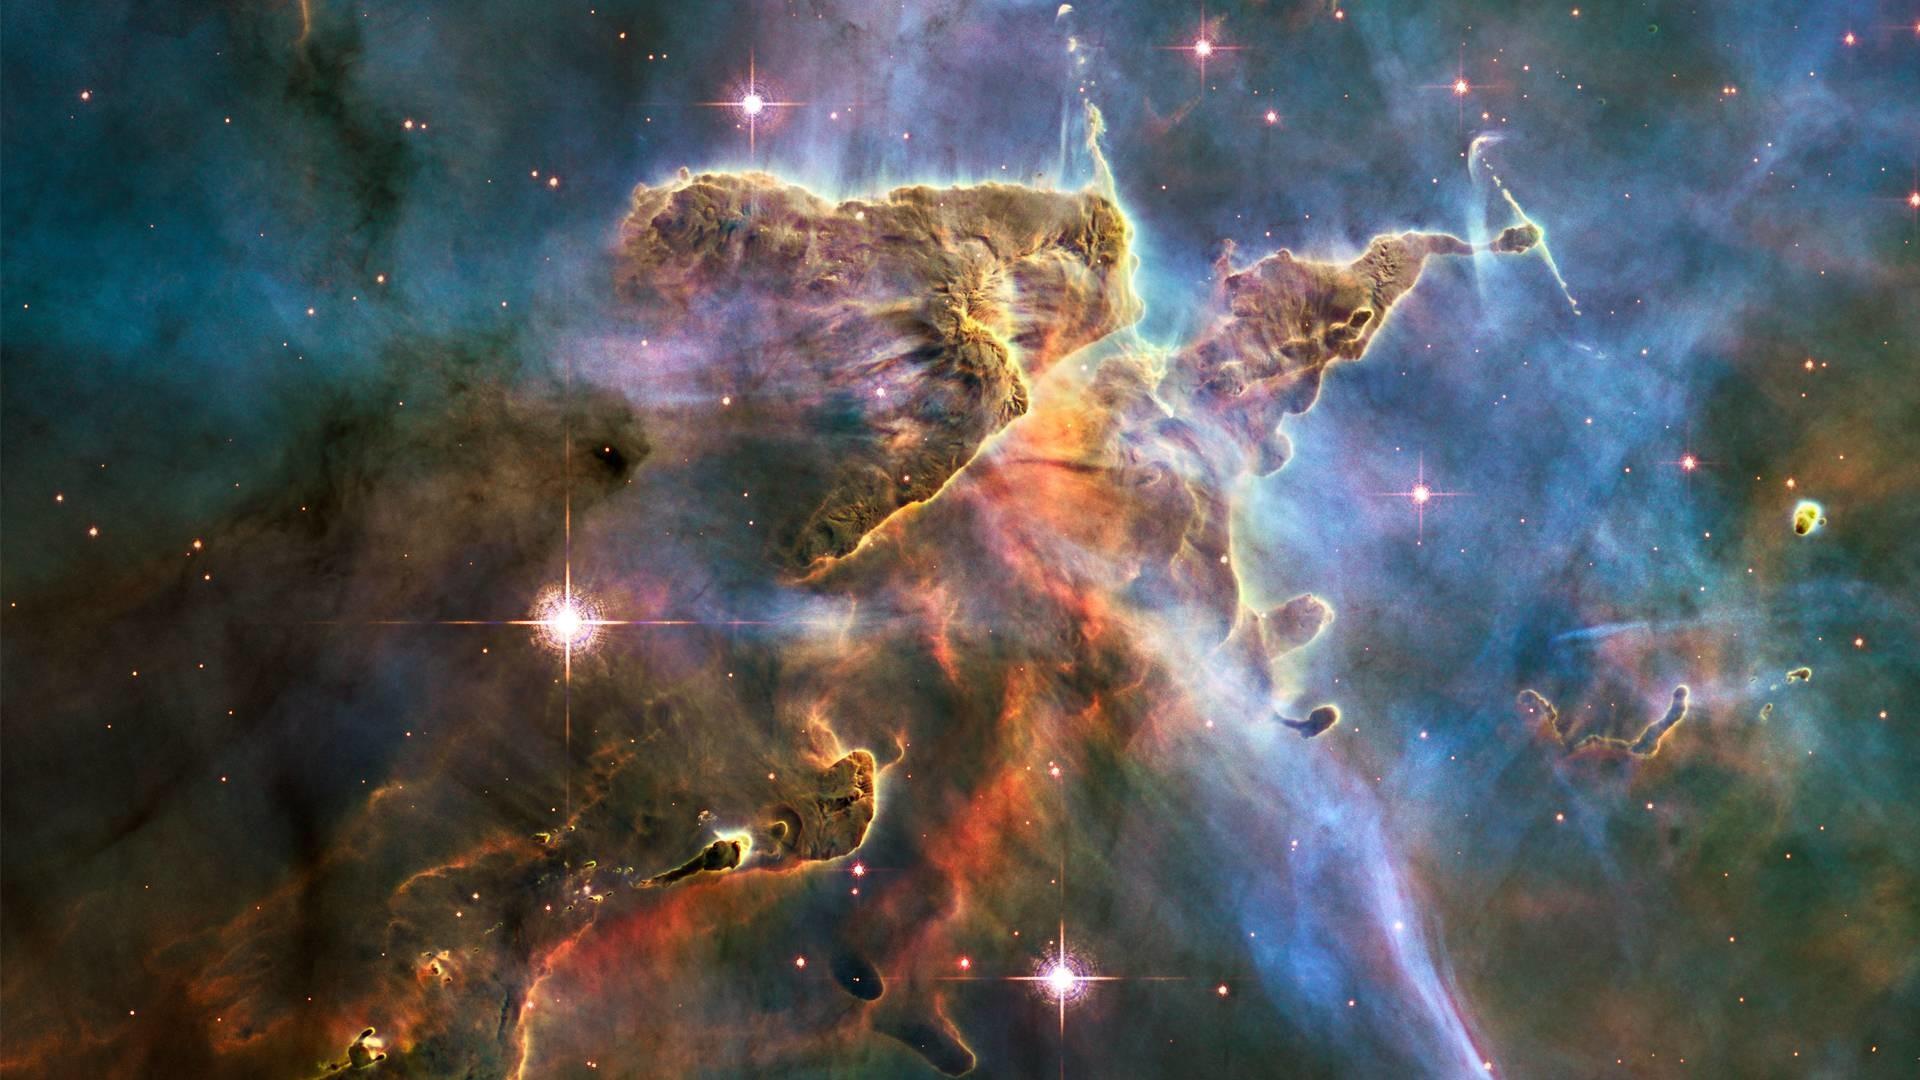 Dark Nebula wallpapers   PostersandPics.com   Pinterest   Nebula wallpaper  and Wallpaper